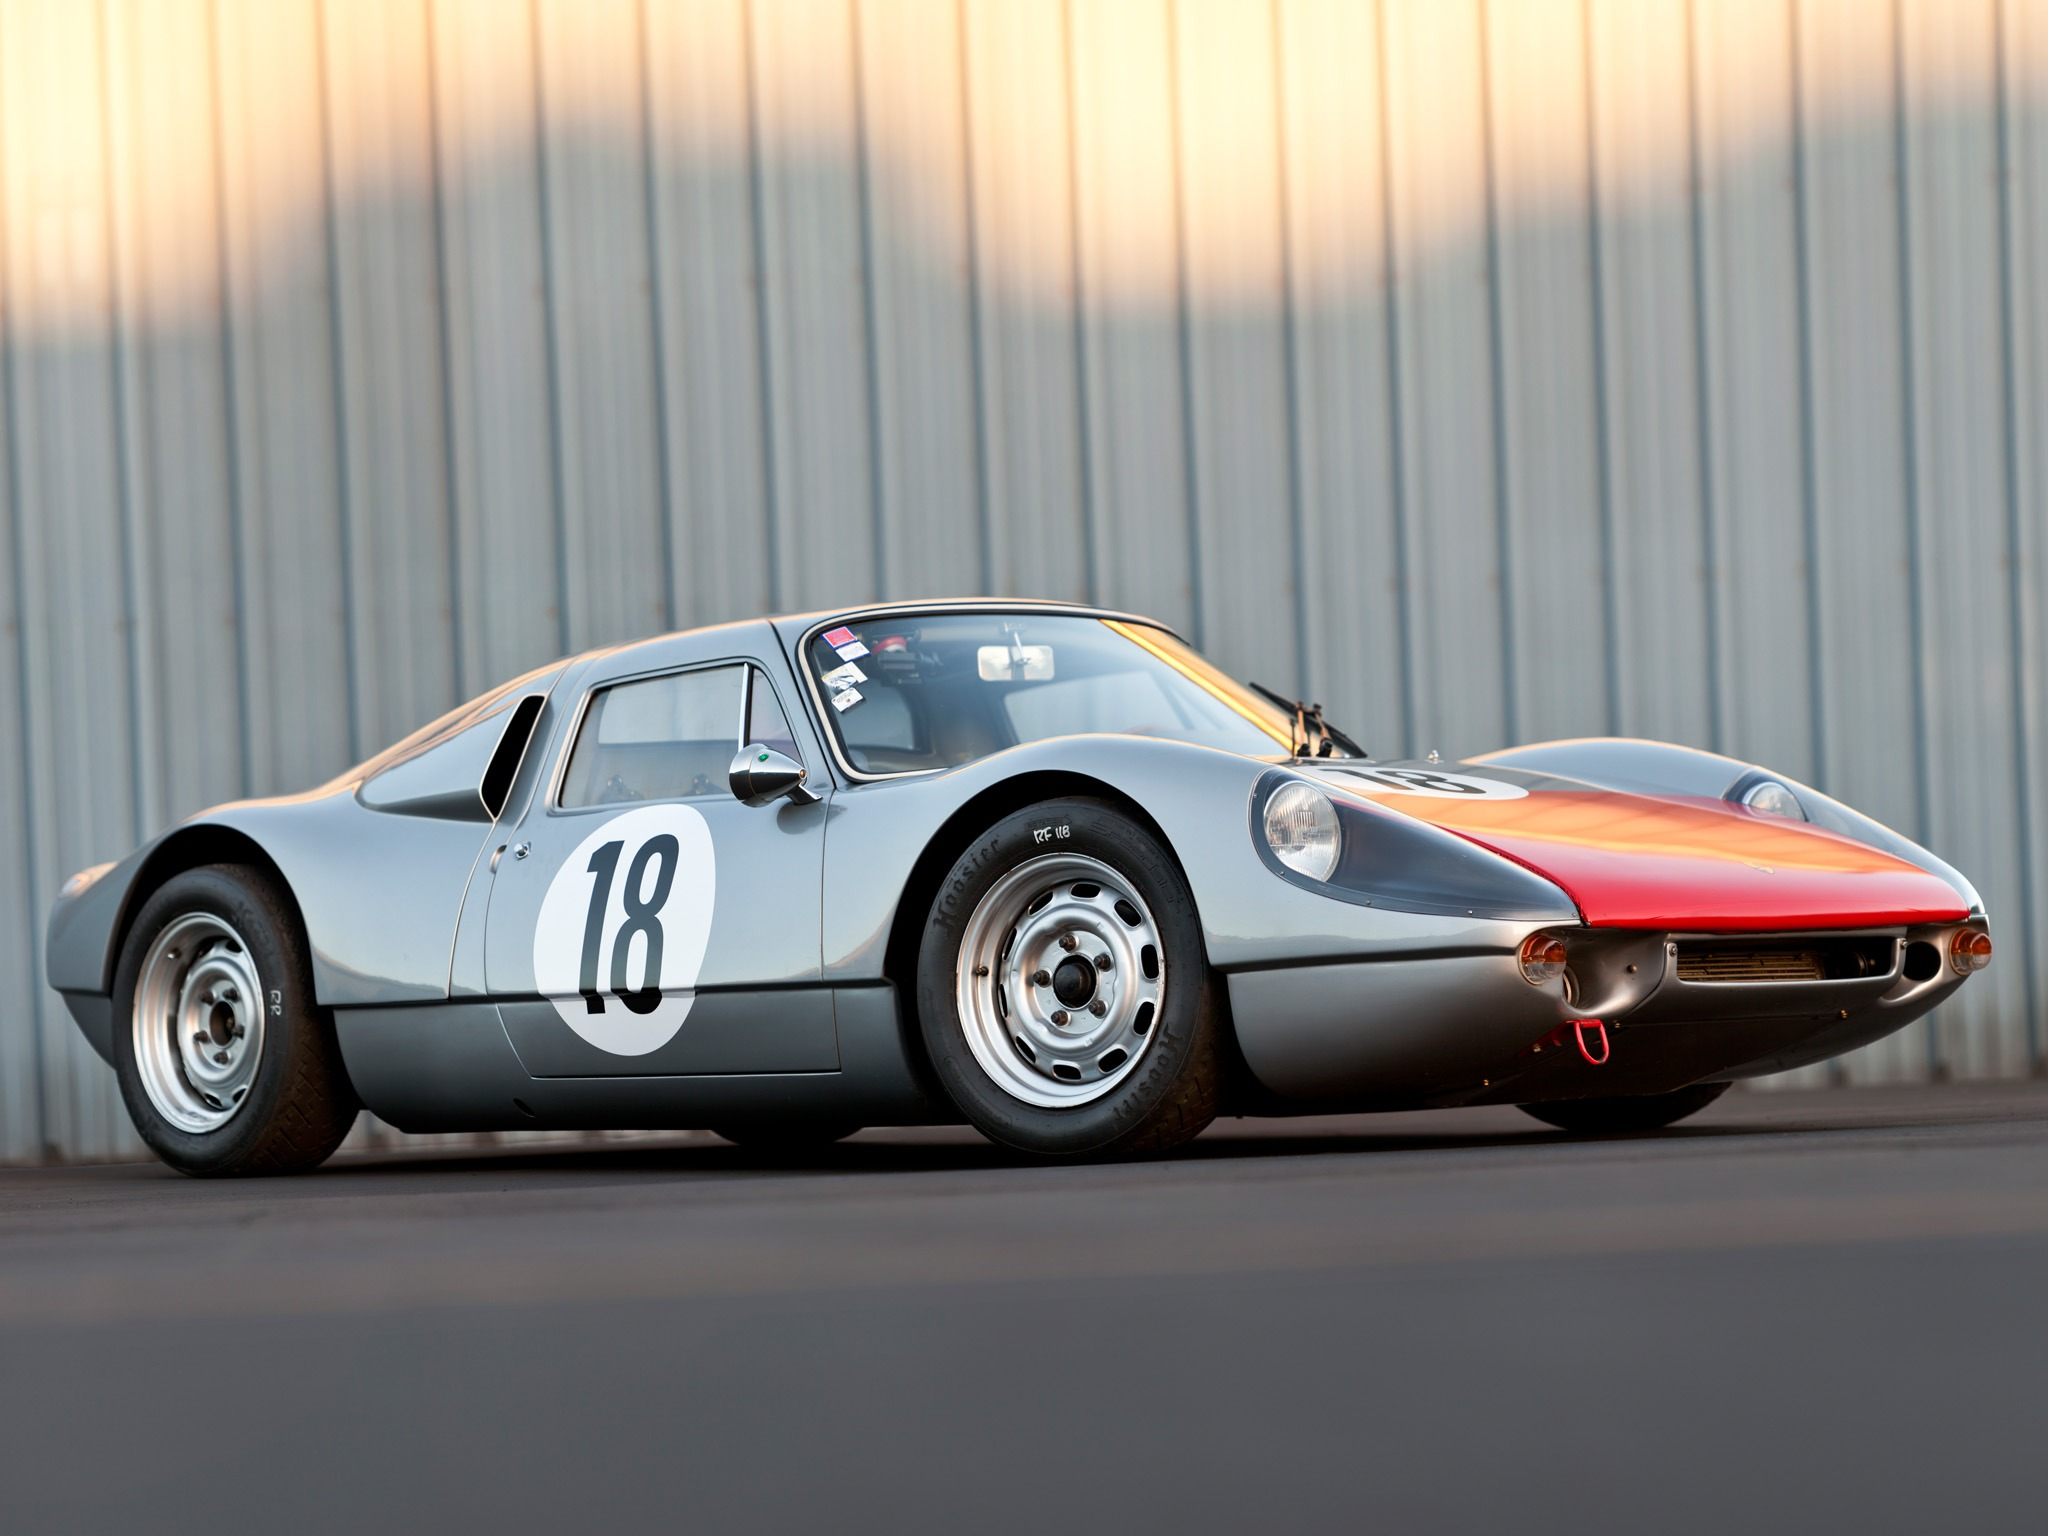 porsche 904 6 carrera gts prototype 1963 old concept cars